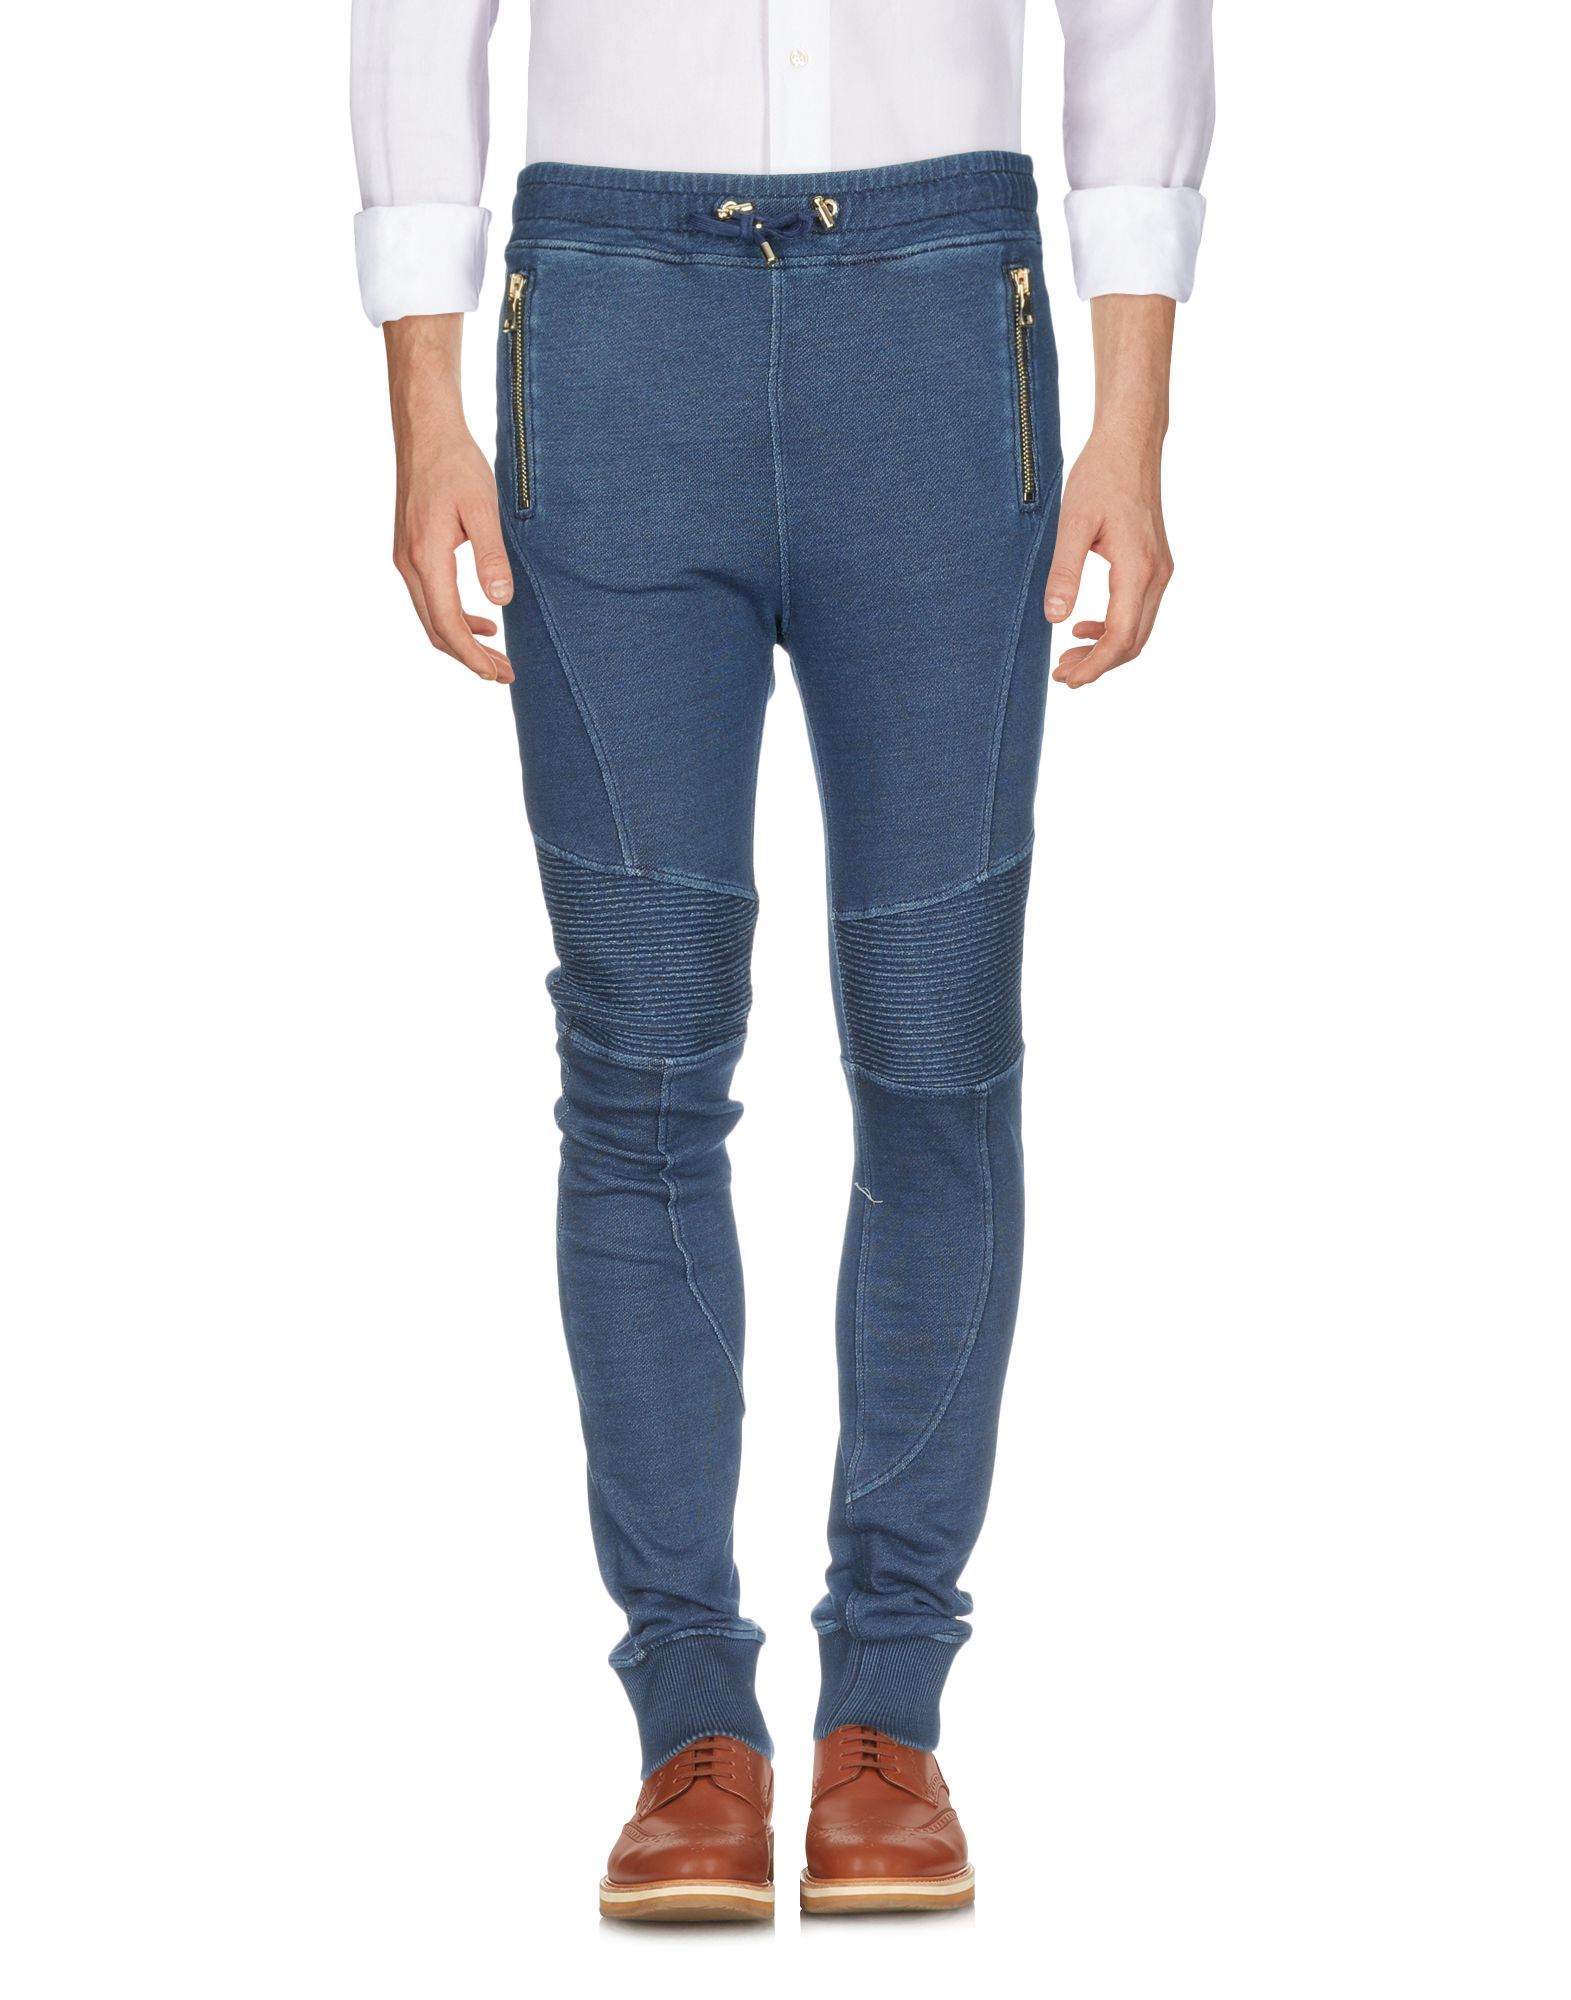 Pantalone Balmain Uomo - Acquista online su